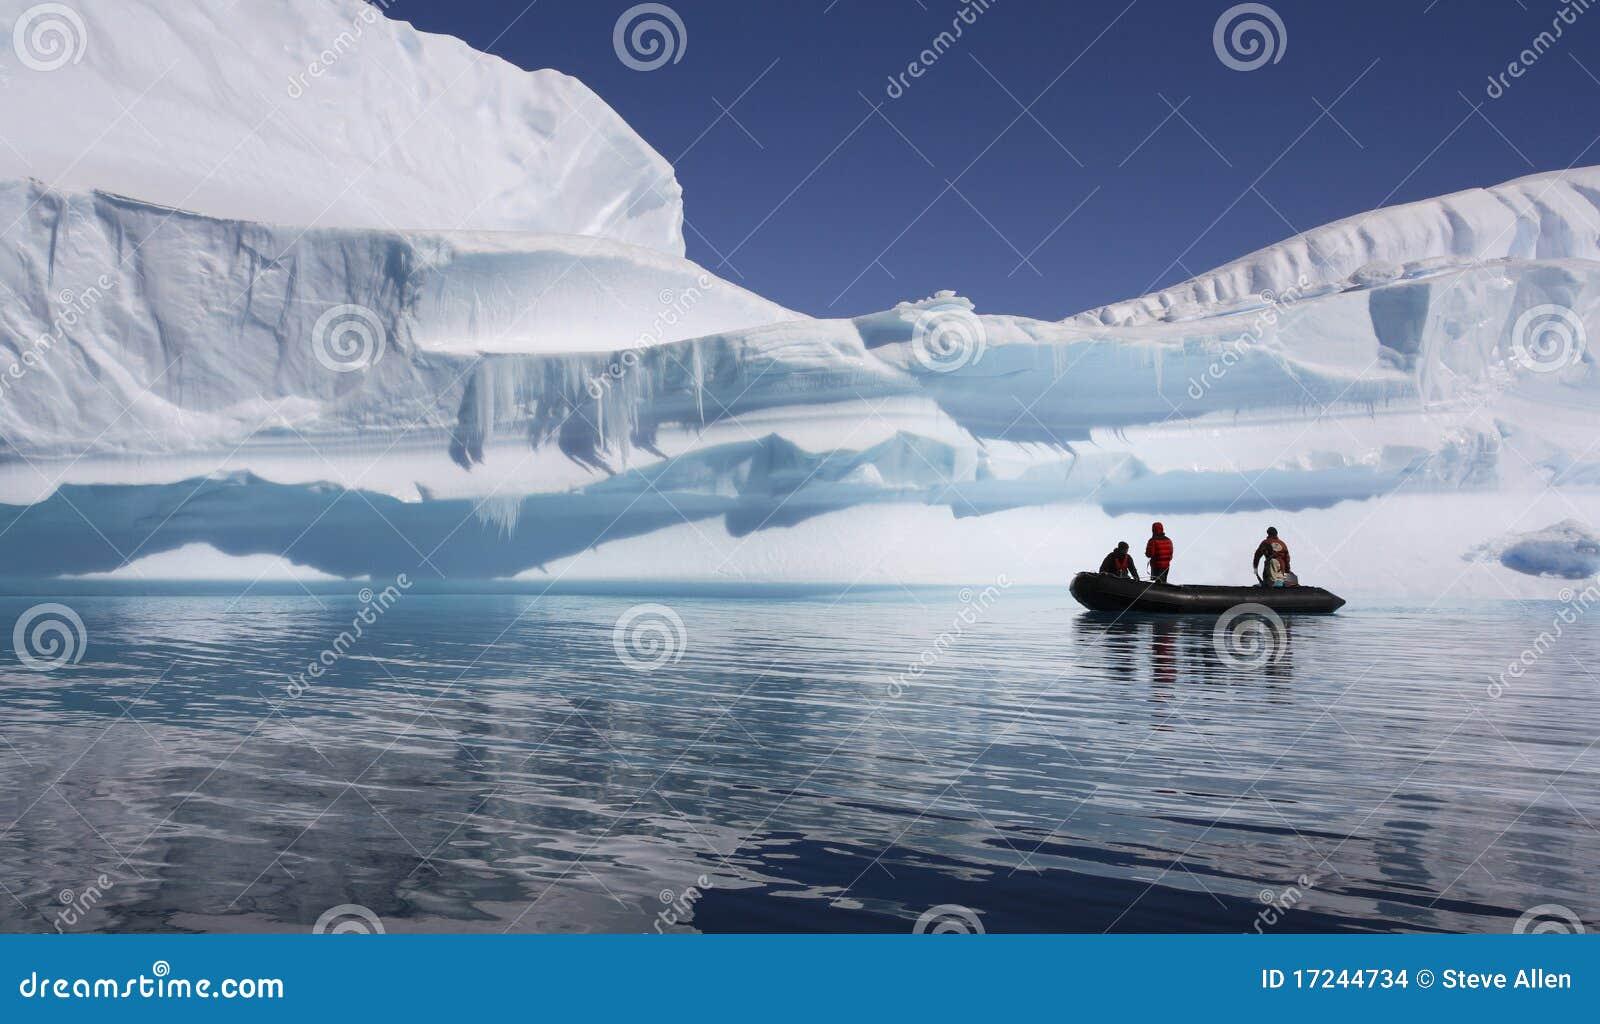 Antarctica - Adventure Tourists